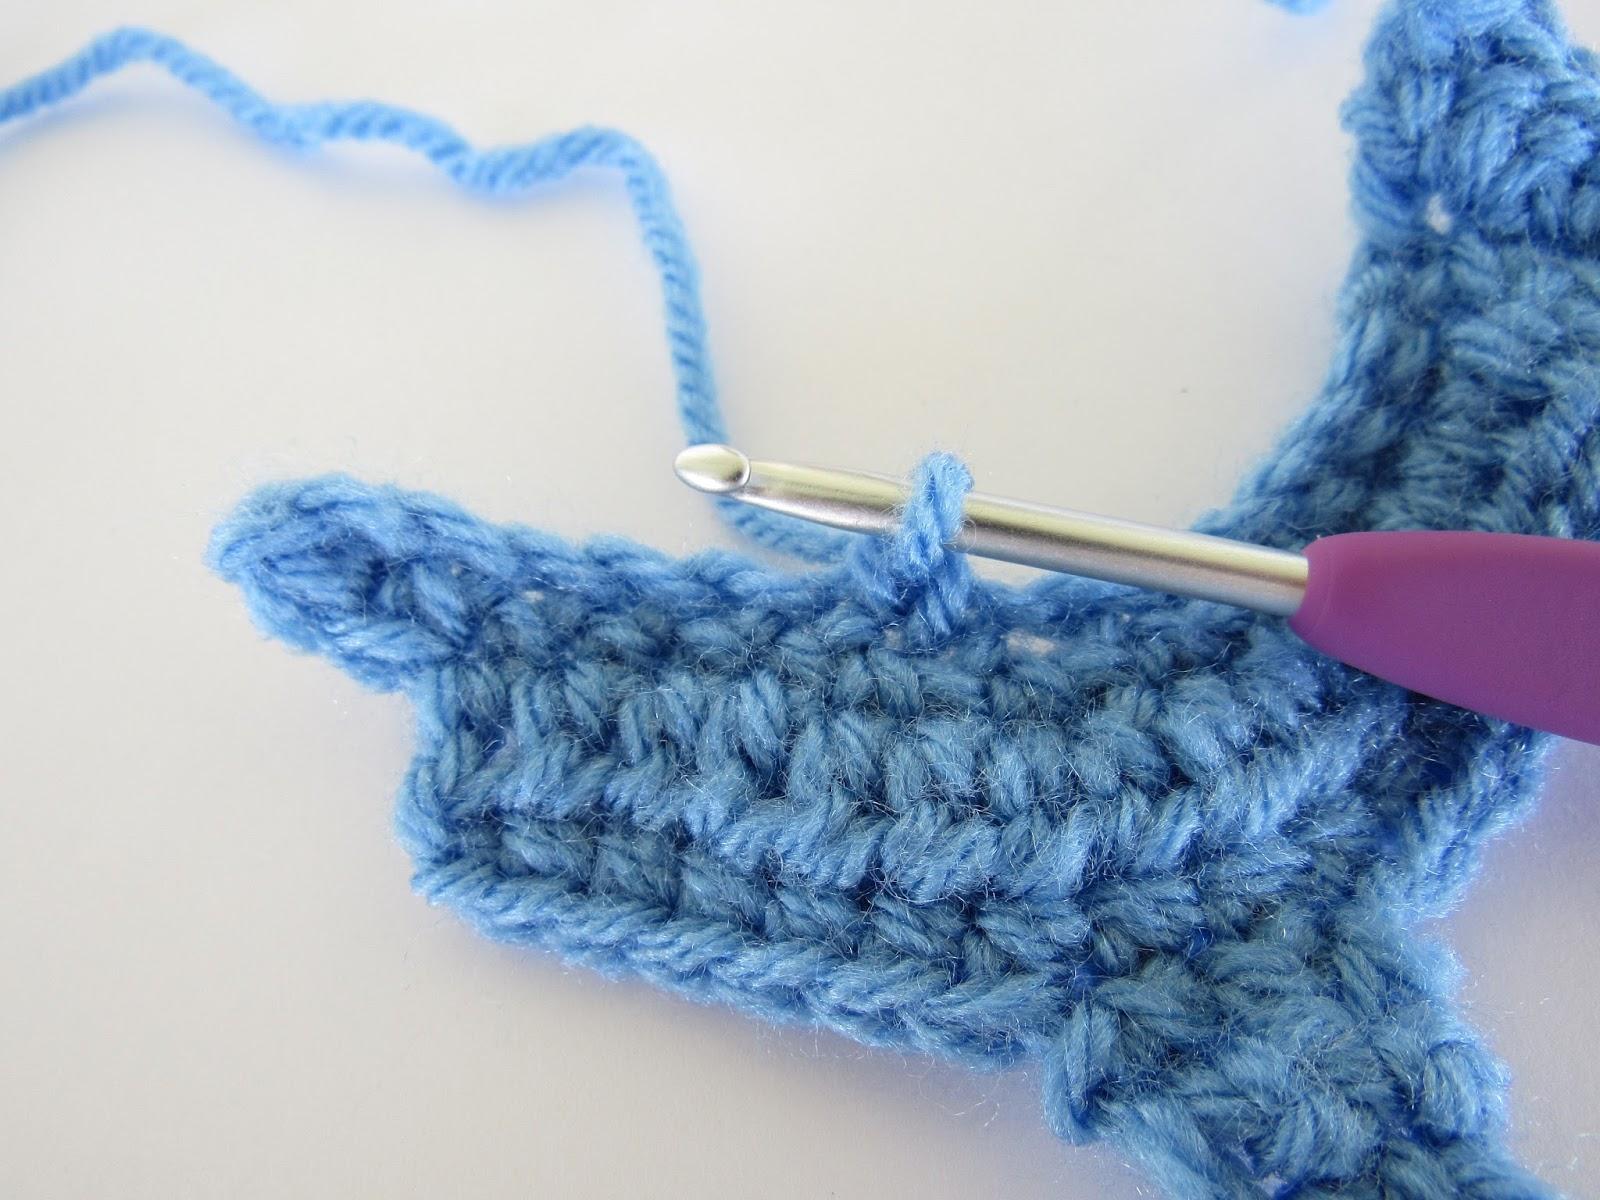 Dolphin Crochet Patterns | LoveToKnow | 1200x1600